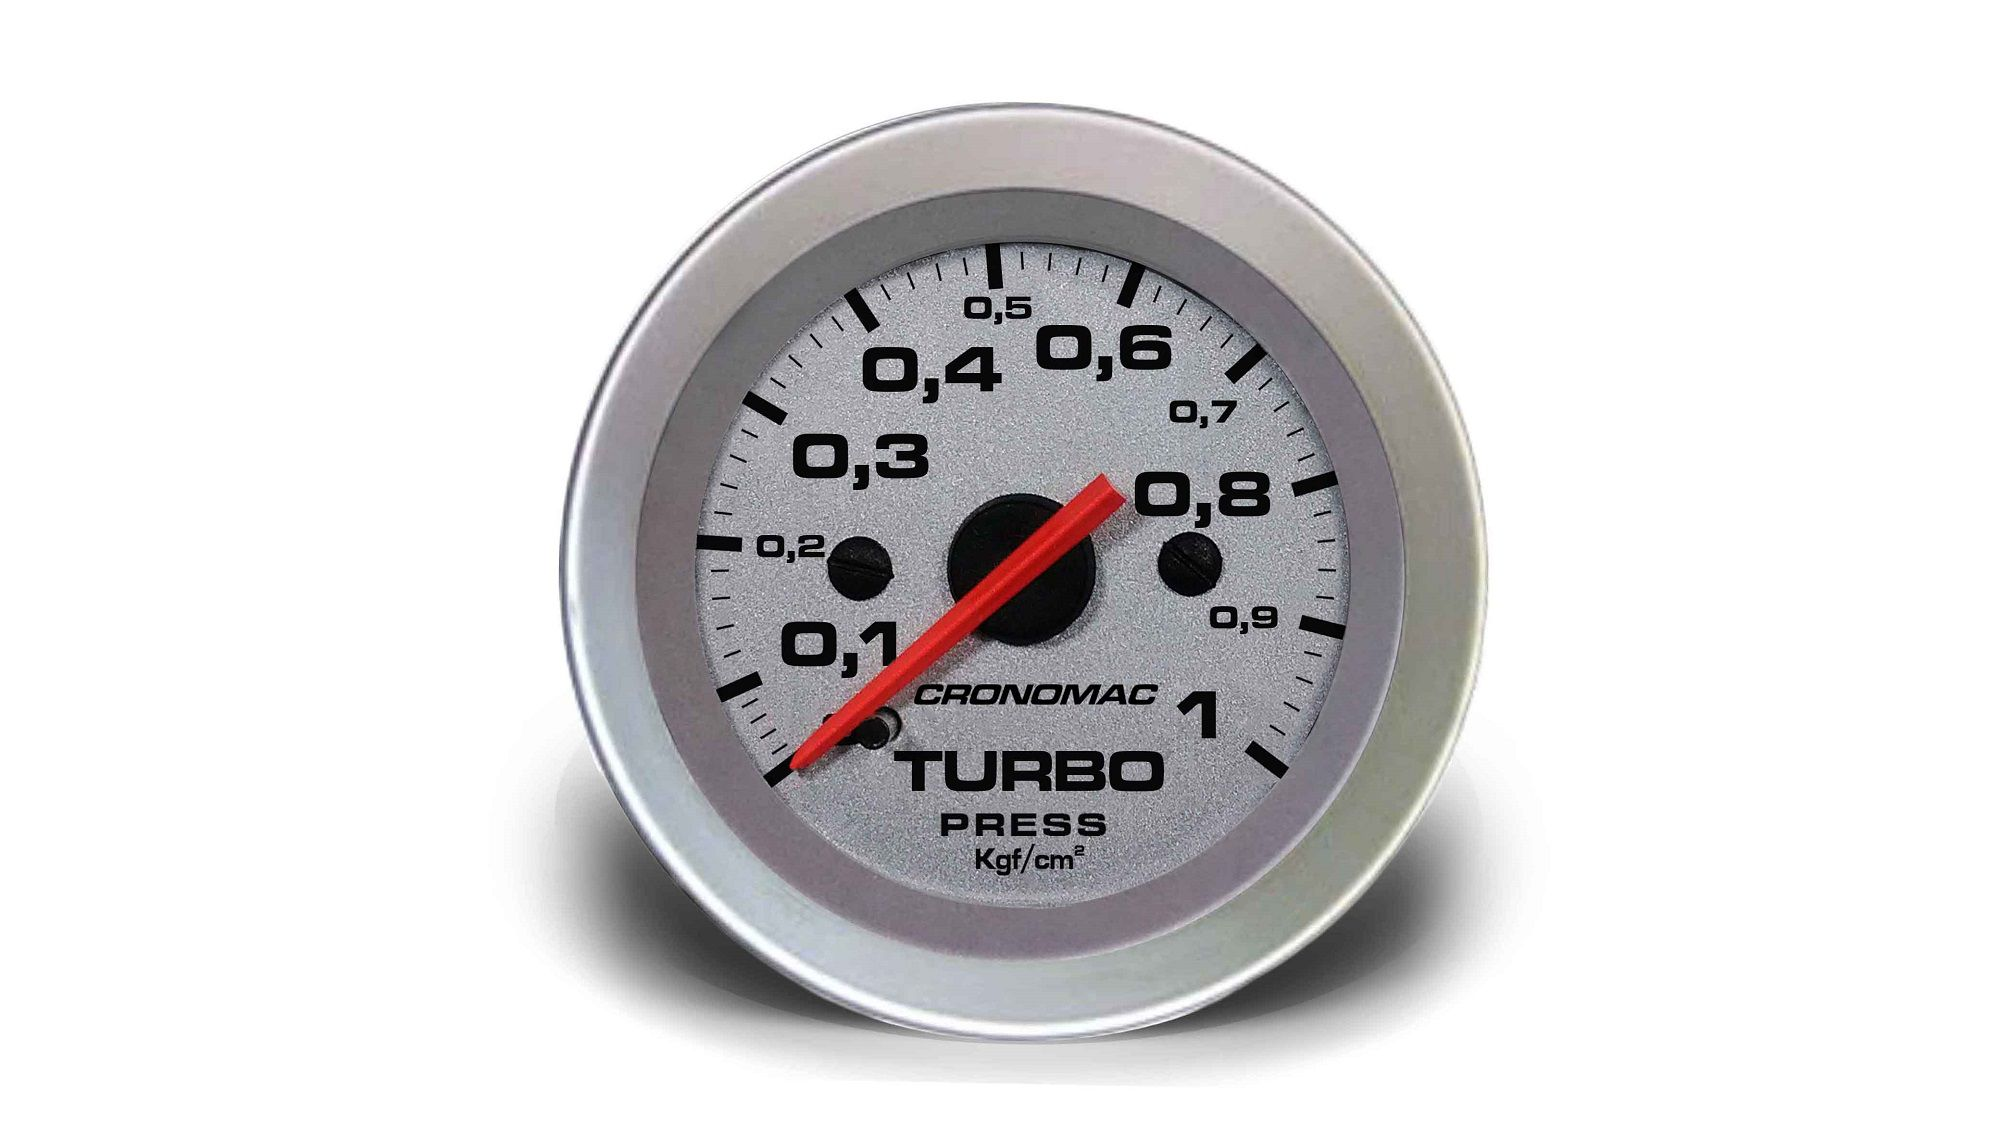 Relogio Pressao de Turbo 1kg Racing 52mm Cronomac